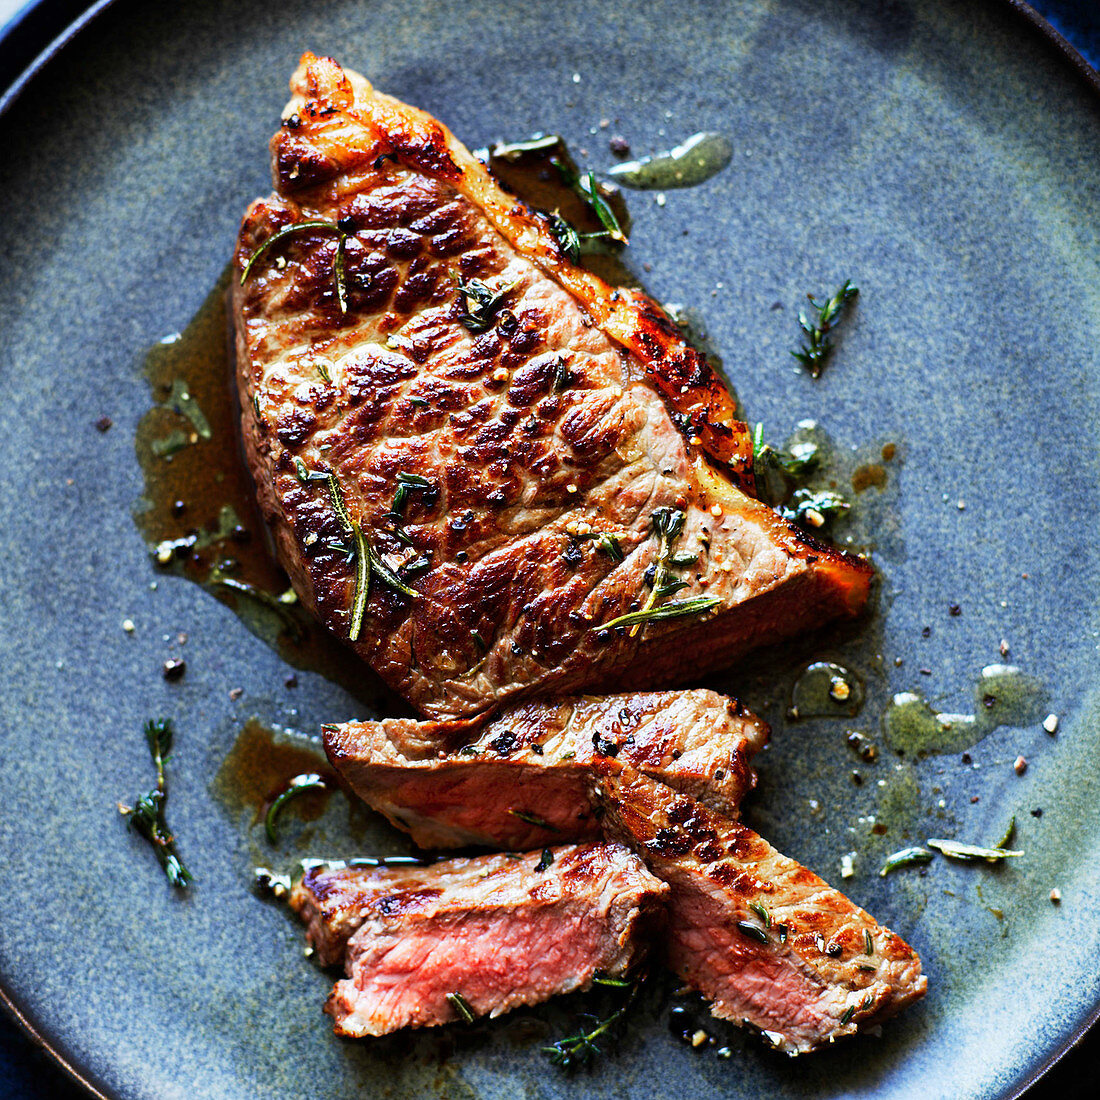 Cut beef steak with herbs